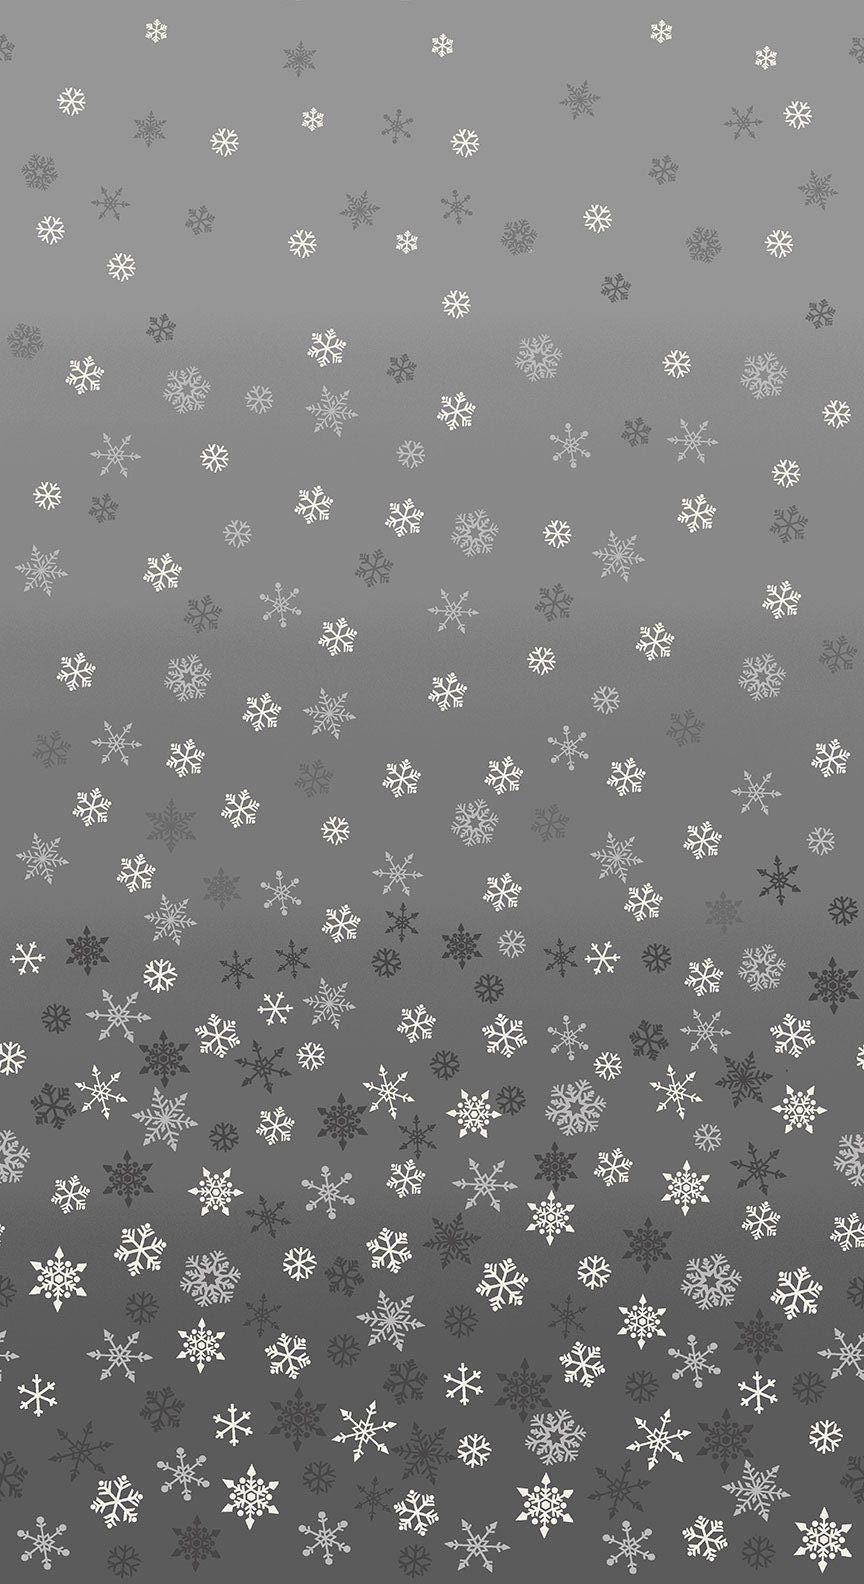 Christmas 21 Scandi - Ombre snowflakes Silver